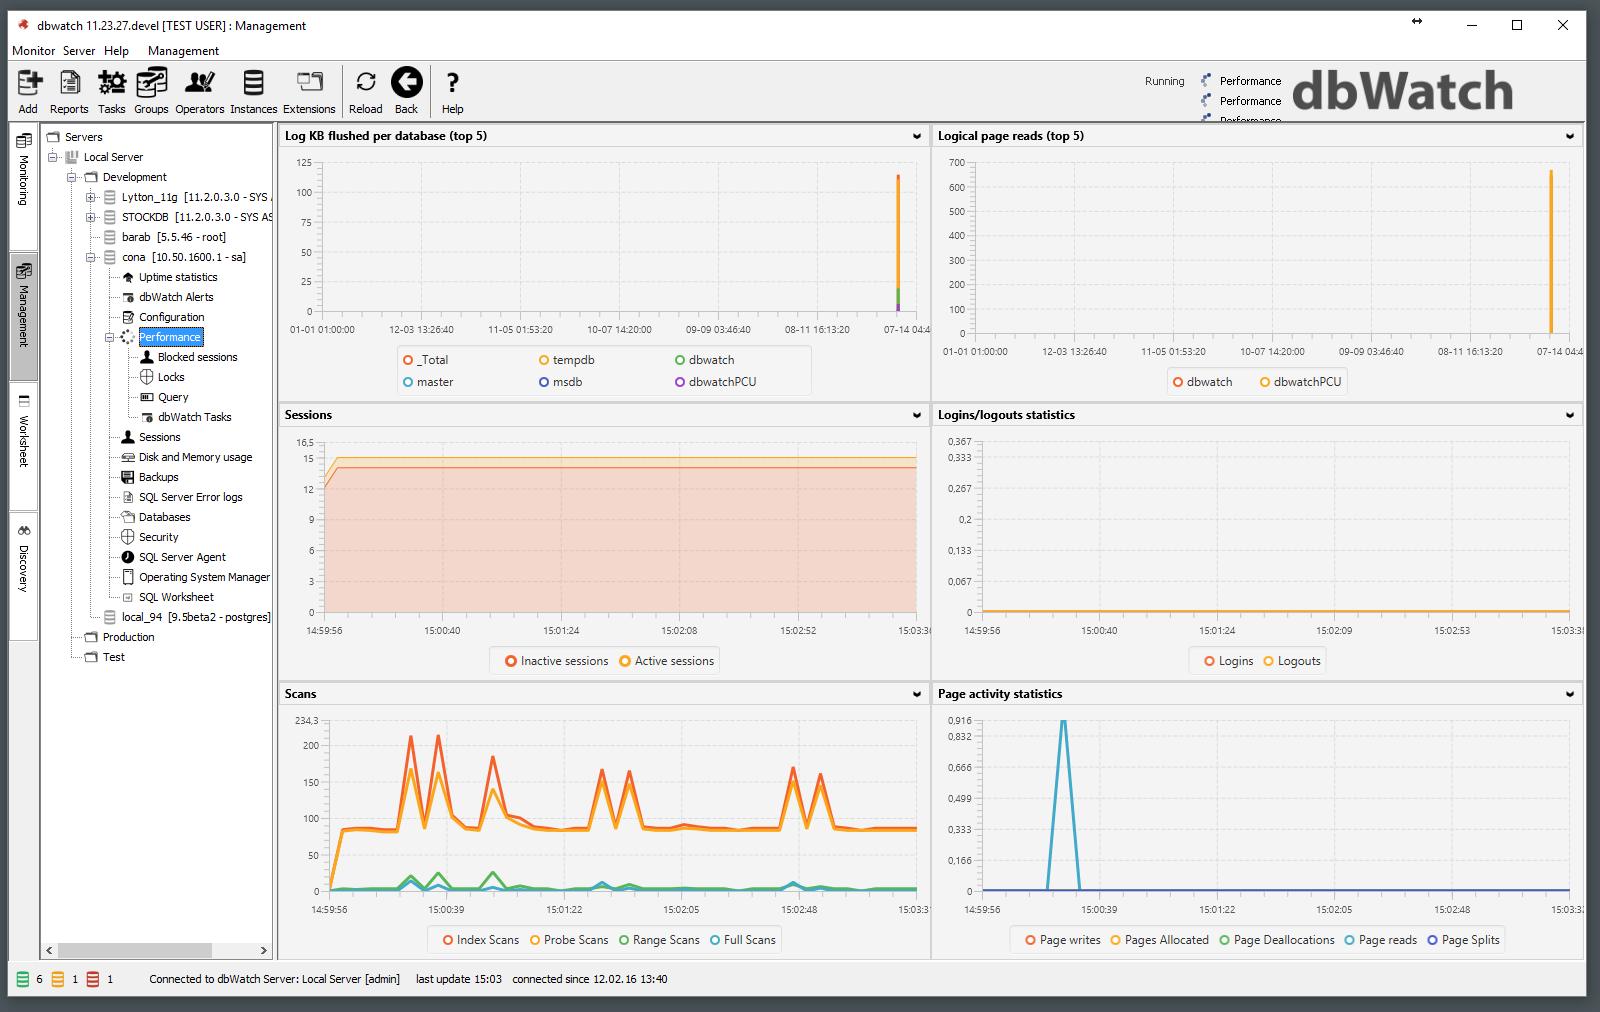 SQLServer performance overview